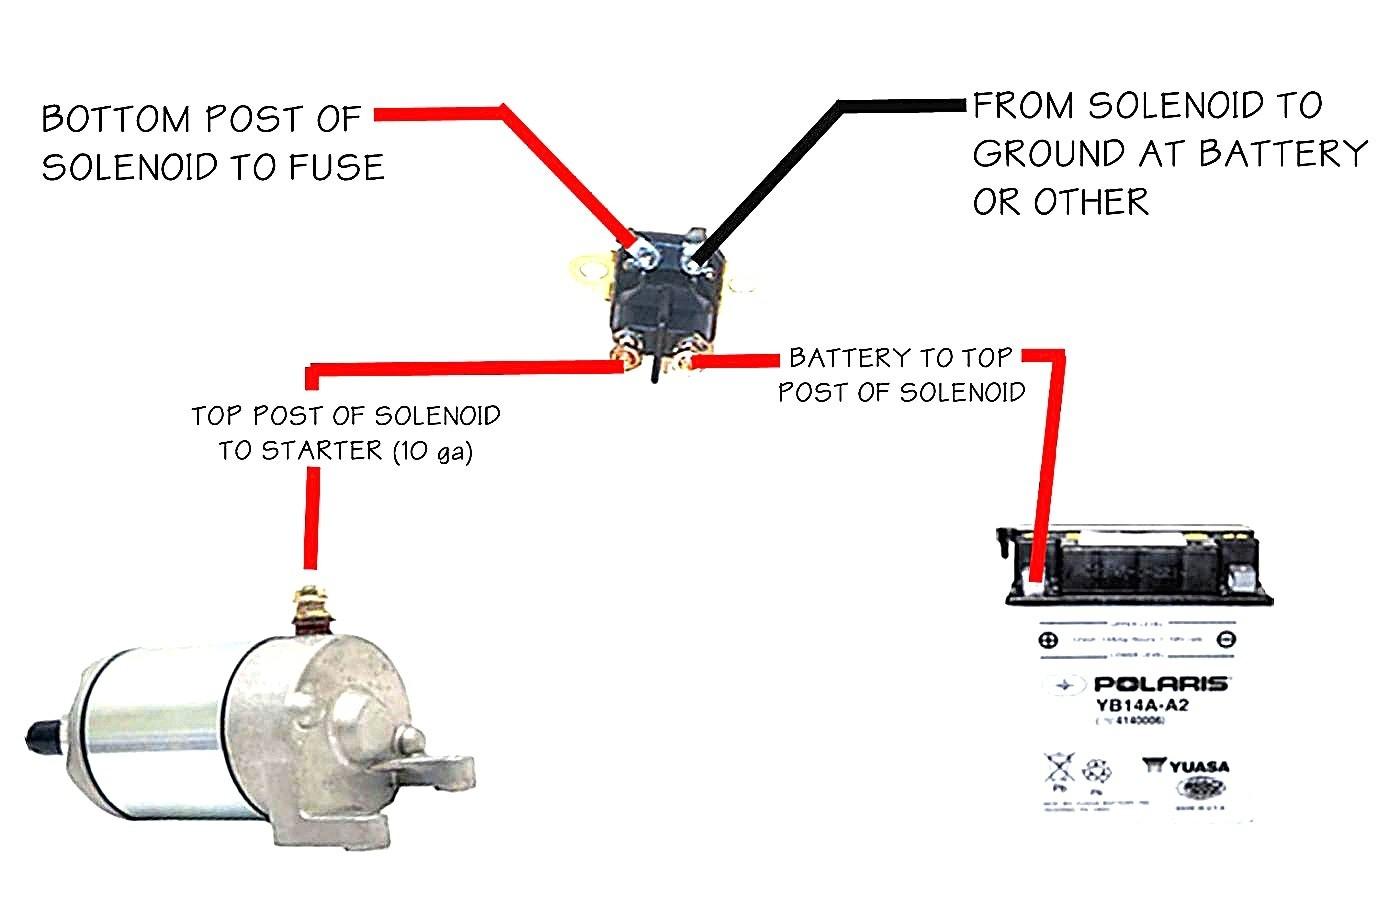 Starter Solenoid Wiring Diagram Starter Solenoid Wiring Diagram - Gm Starter Solenoid Wiring Diagram